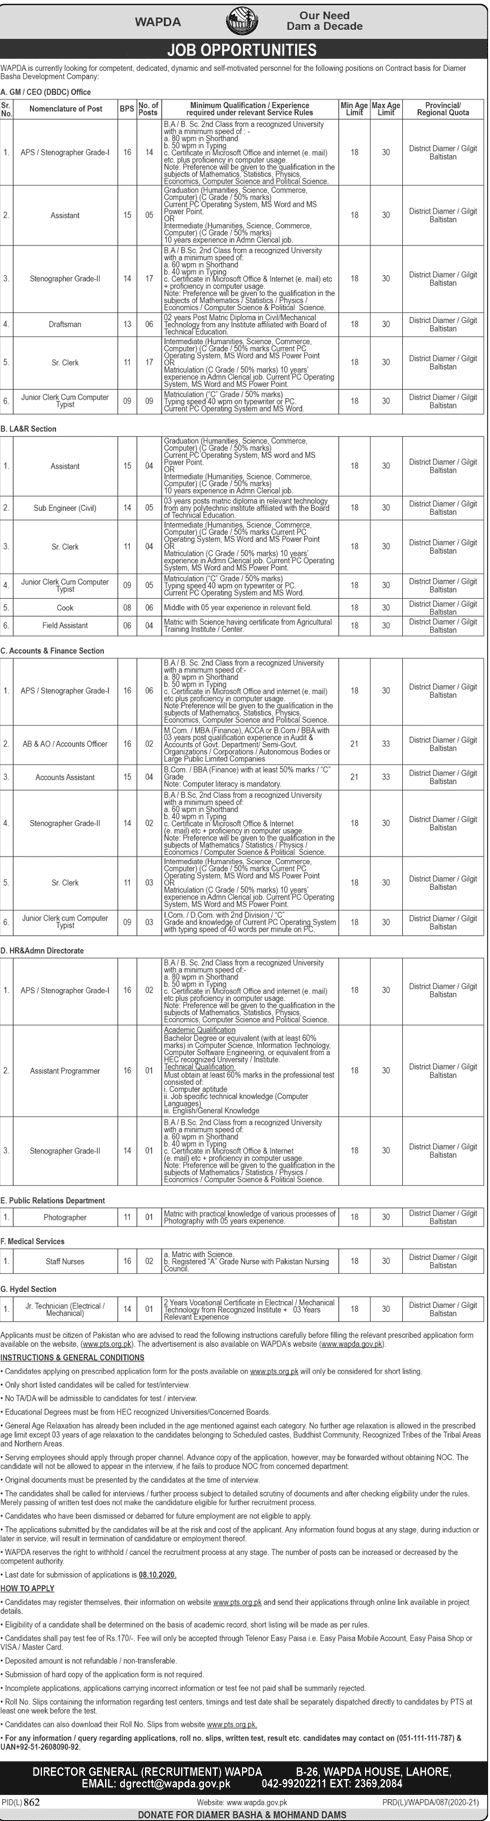 Water And Power Development Authority WAPDA Jobs September 2020 (124 Posts)